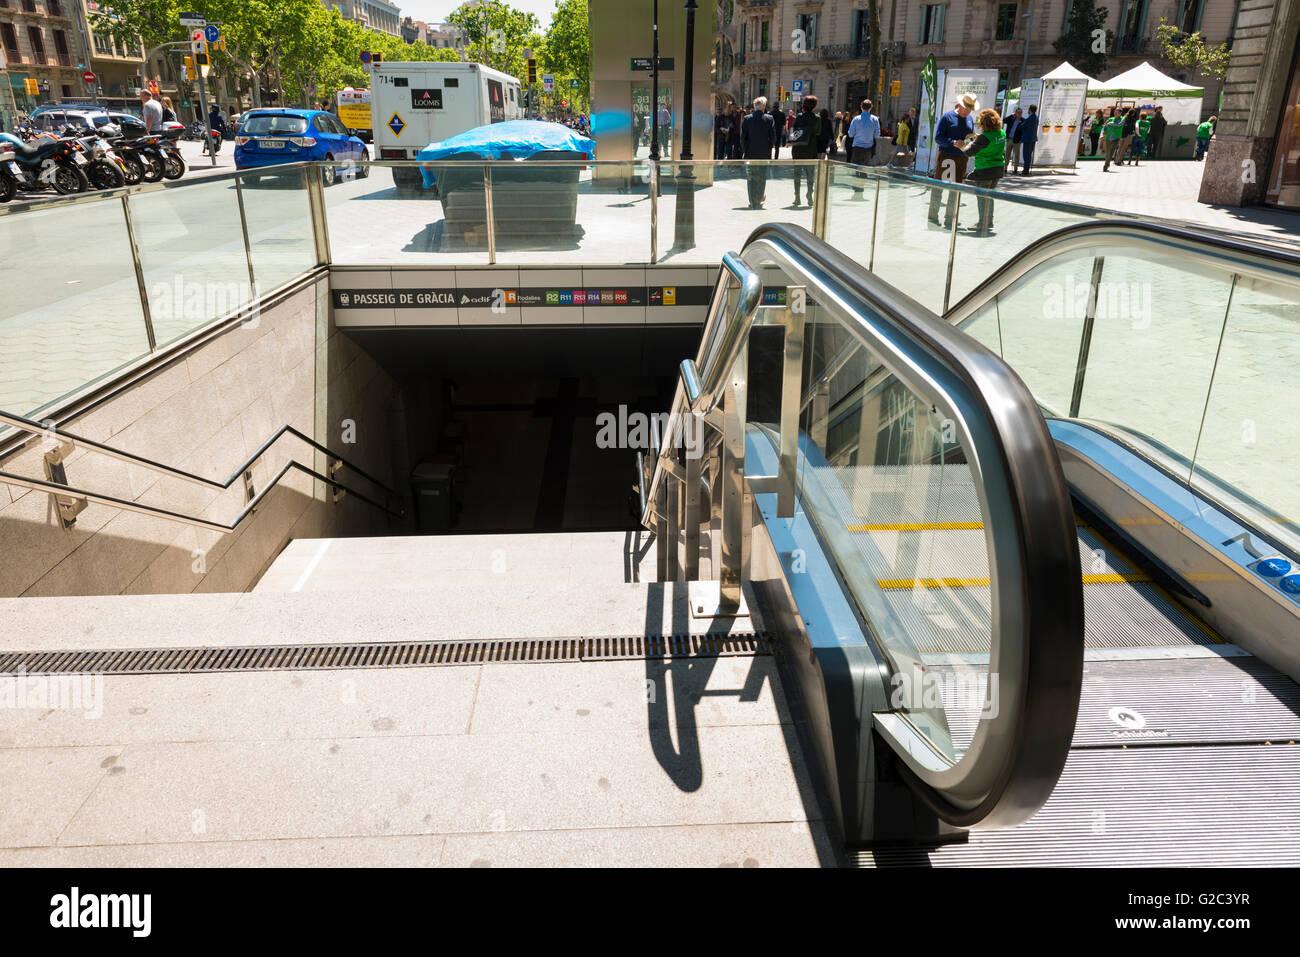 Spain Catalonia Barcelona Eixample Passeig de Gracia Metro subway underground station entrance stairs escalator - Stock Image